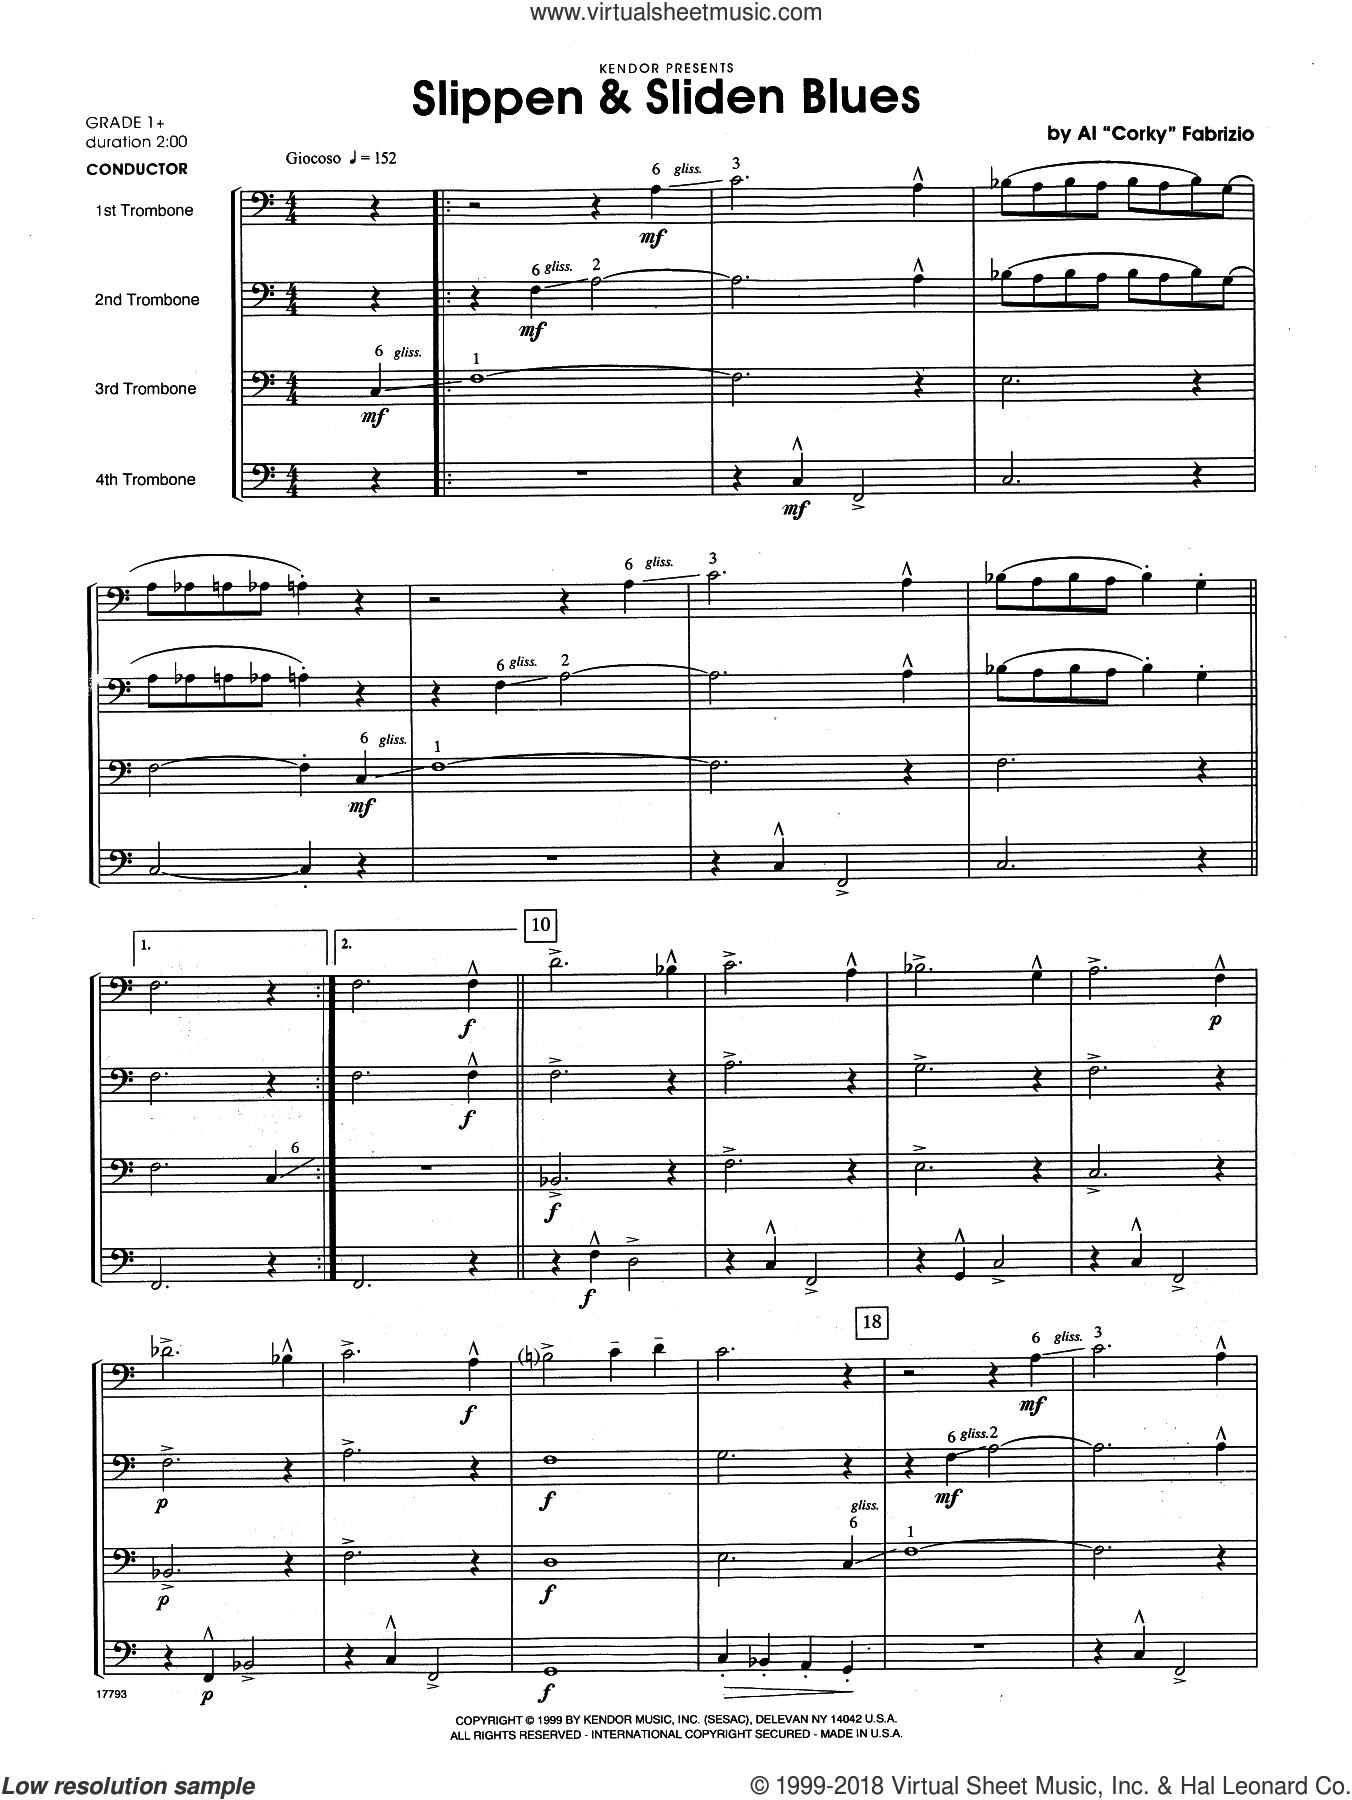 Slippen and Sliden Blues (COMPLETE) sheet music for trombone quintet by Al 'Corky' Fabrizio, intermediate skill level